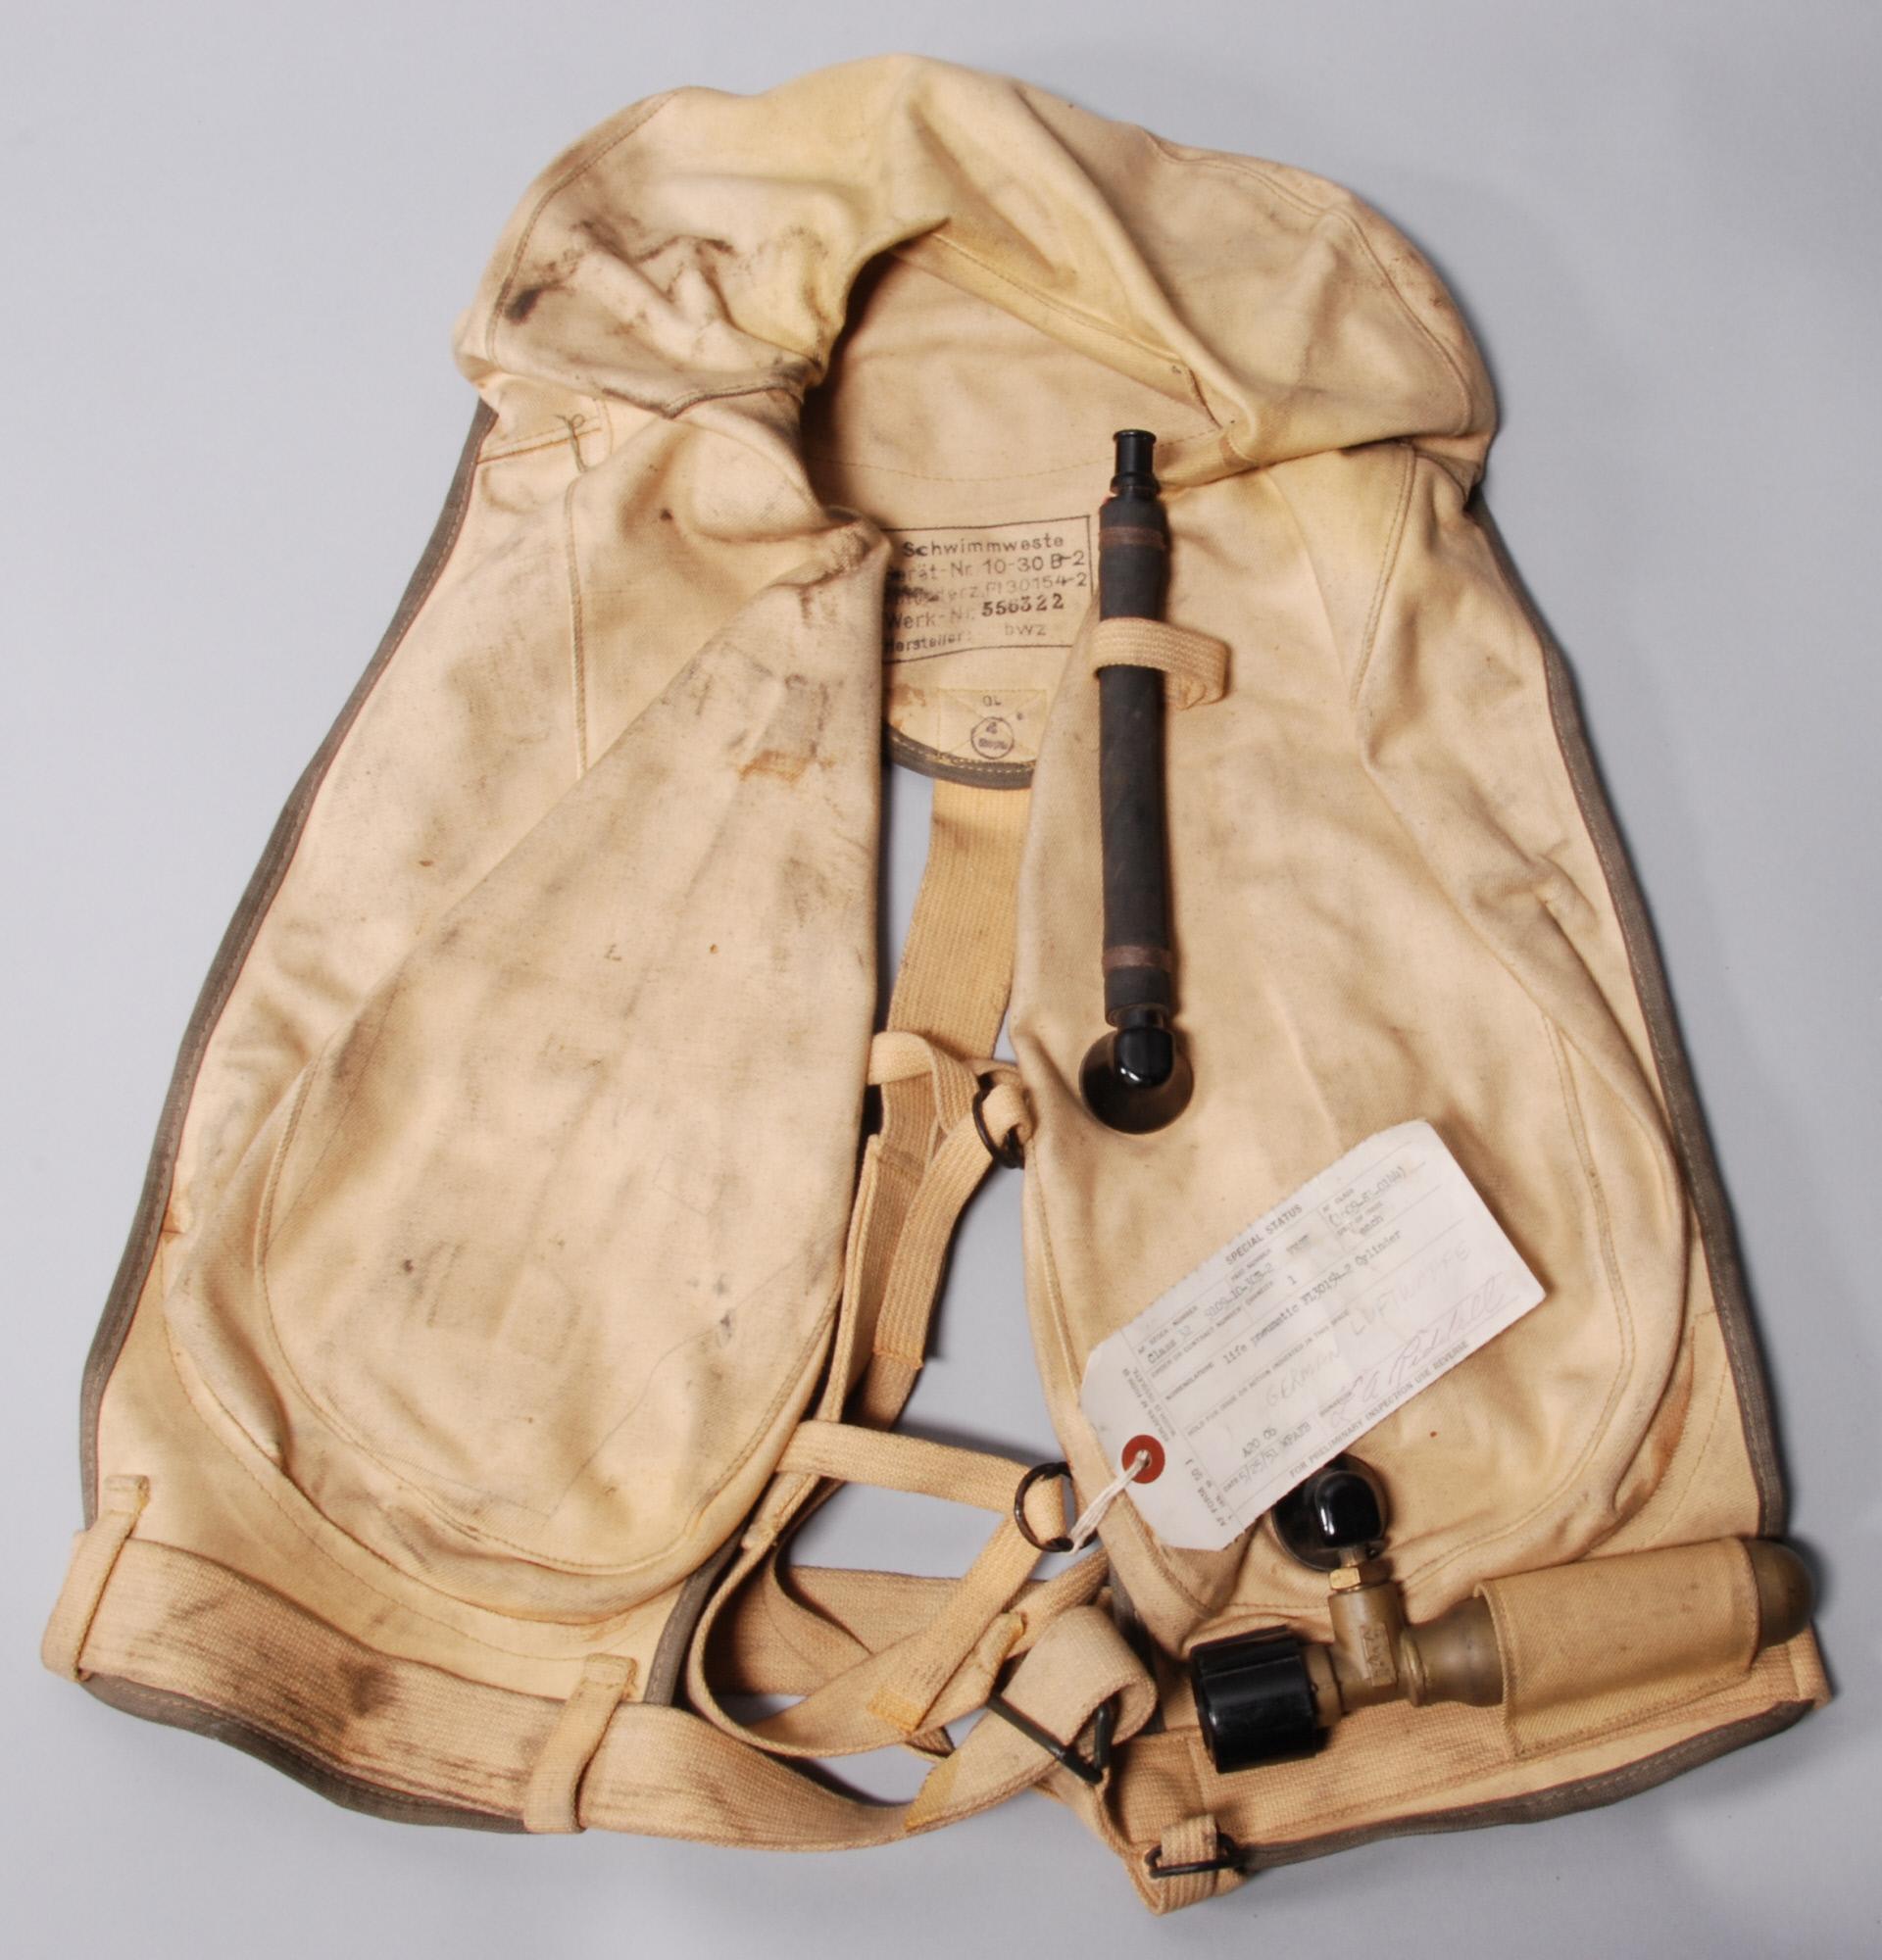 Bob Braham's Lifejacket